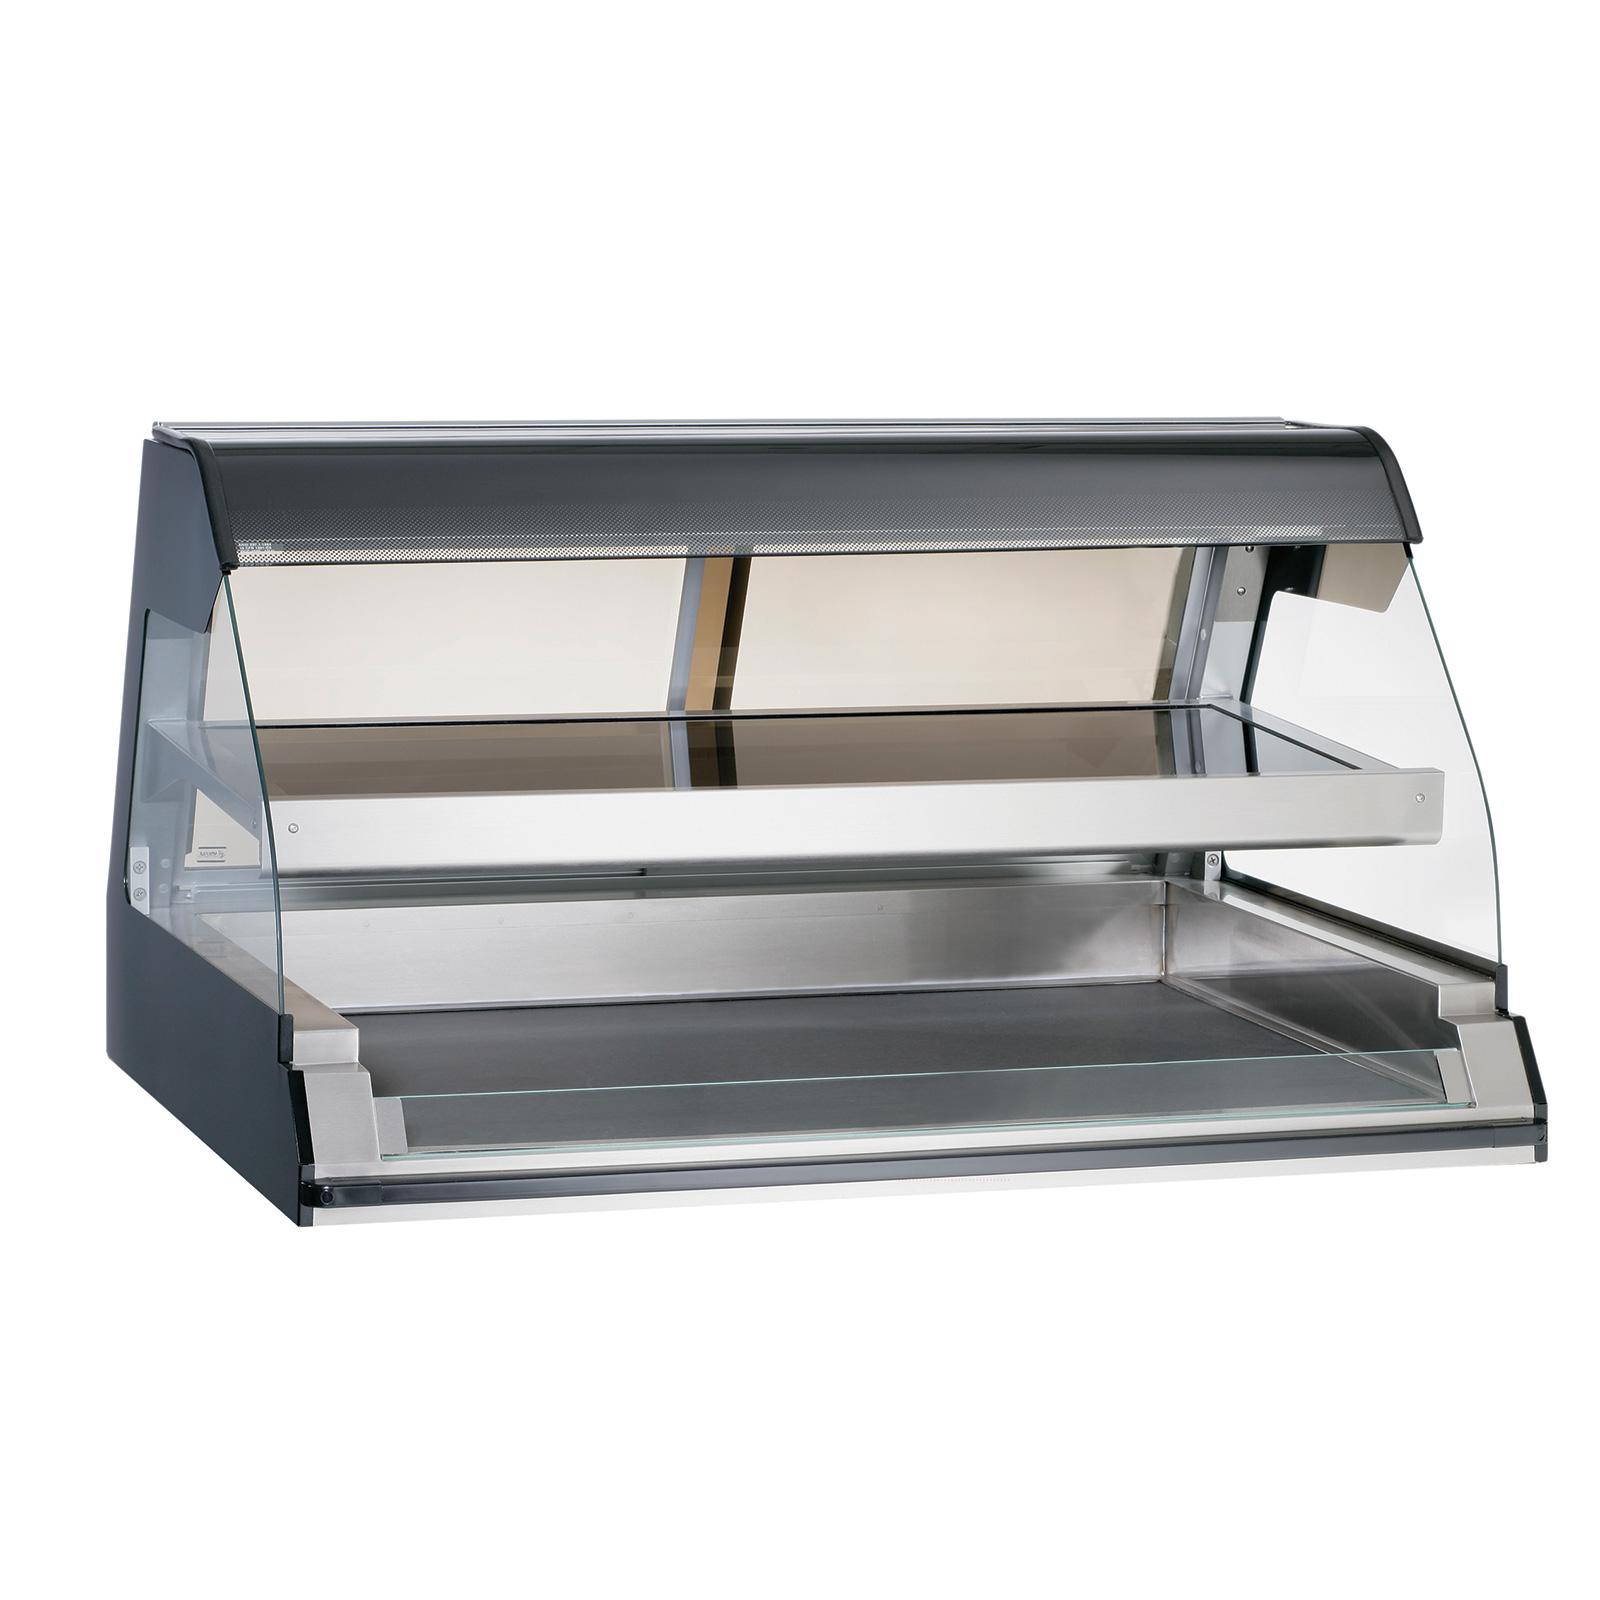 Alto-Shaam ED2-48/2S-C display case, heated deli, countertop